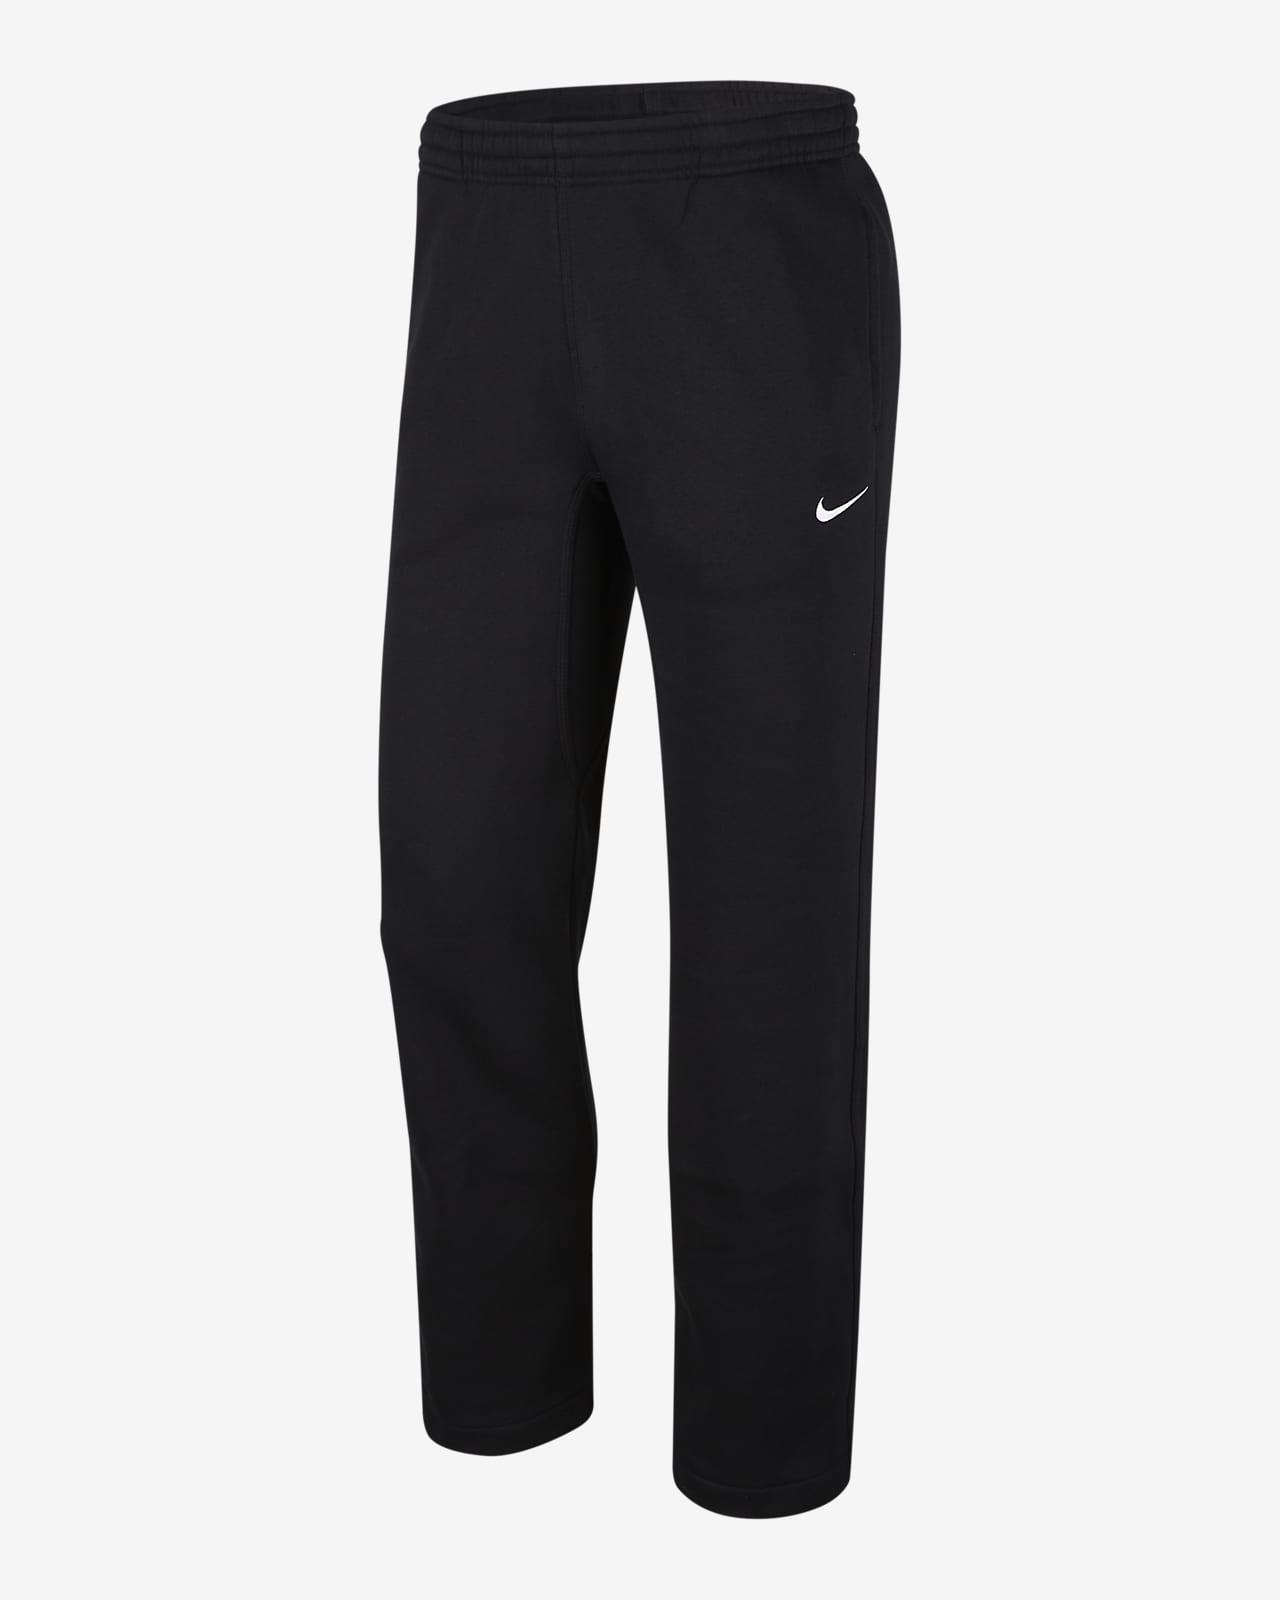 Nike Sportswear Swoosh Club 男子长裤